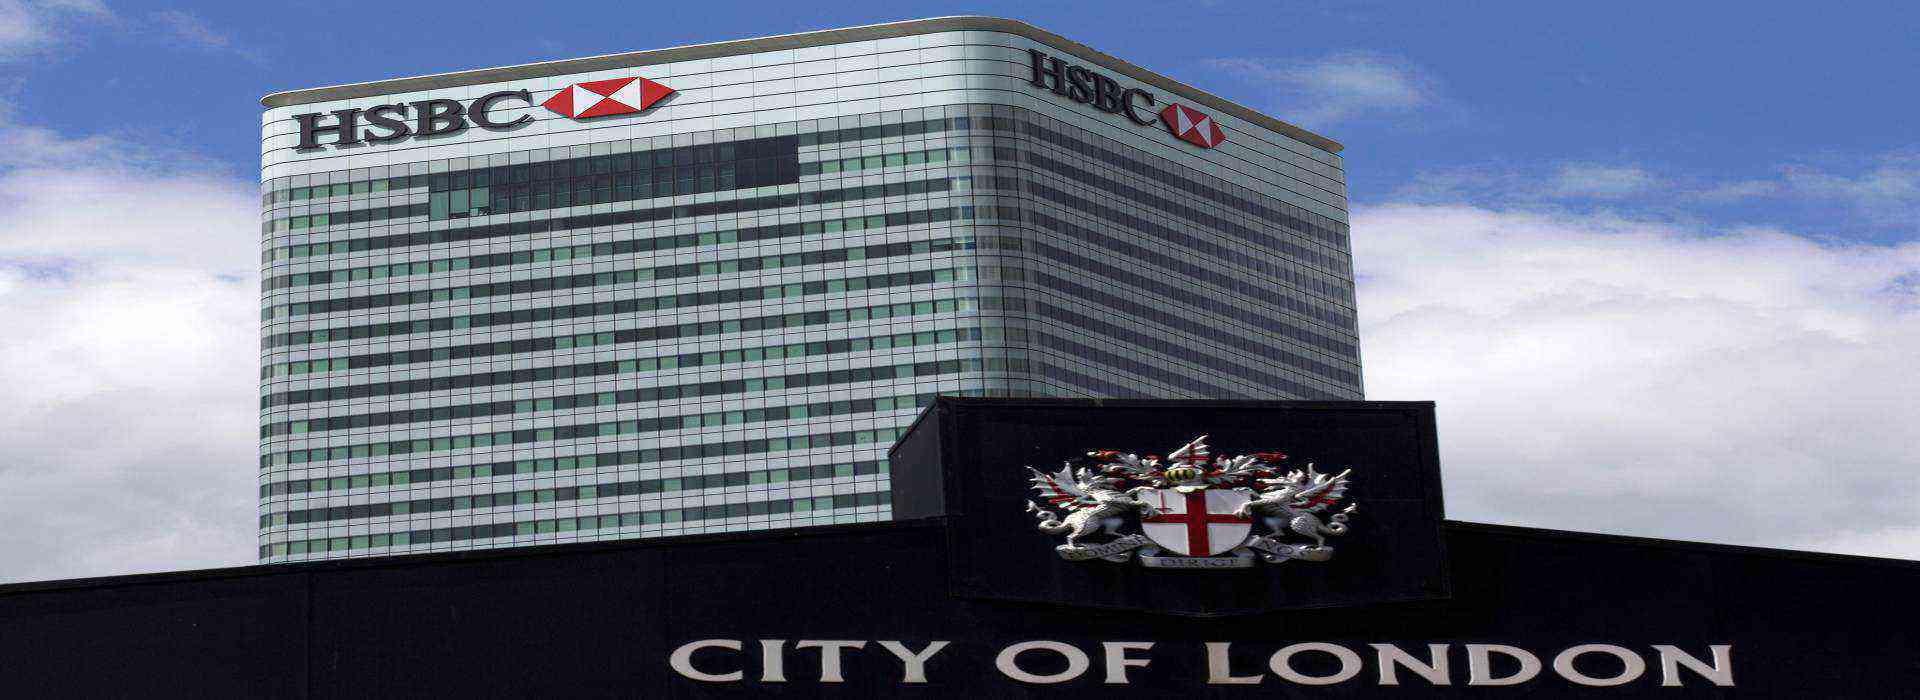 HSBC UK Customer Care Number, Head Office Address